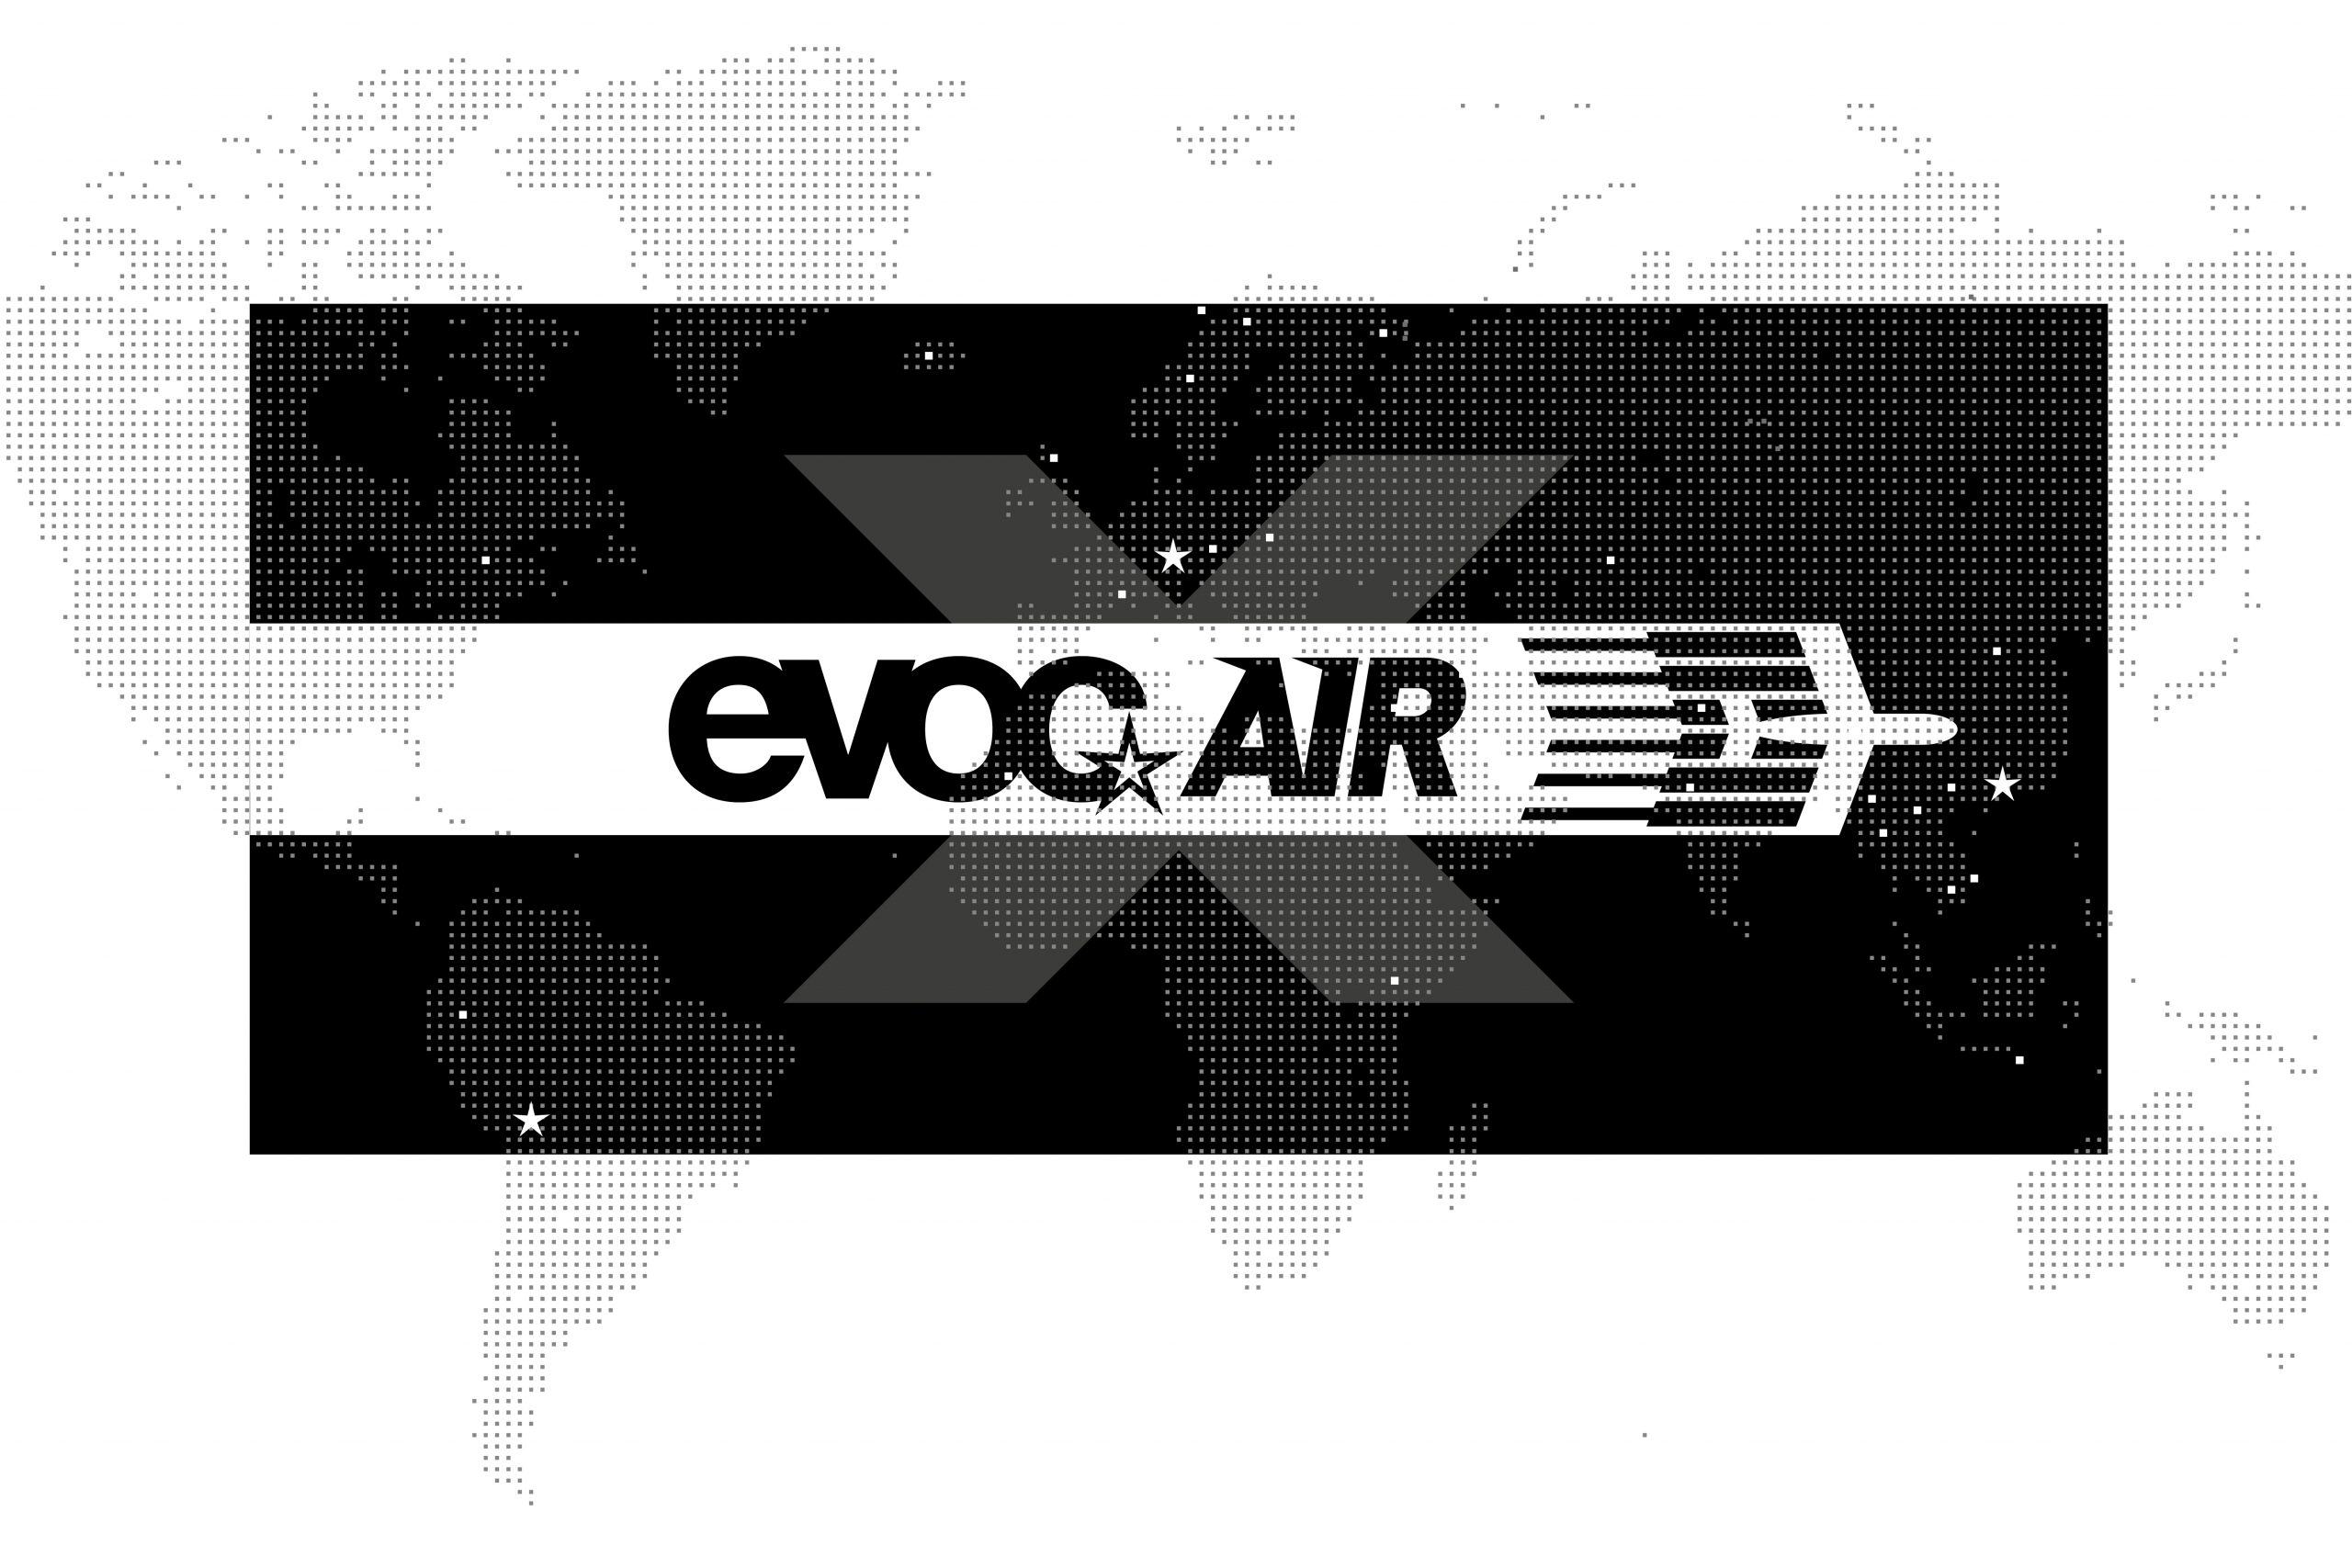 evocsports_mailing_distributoren_by_majormajor_2